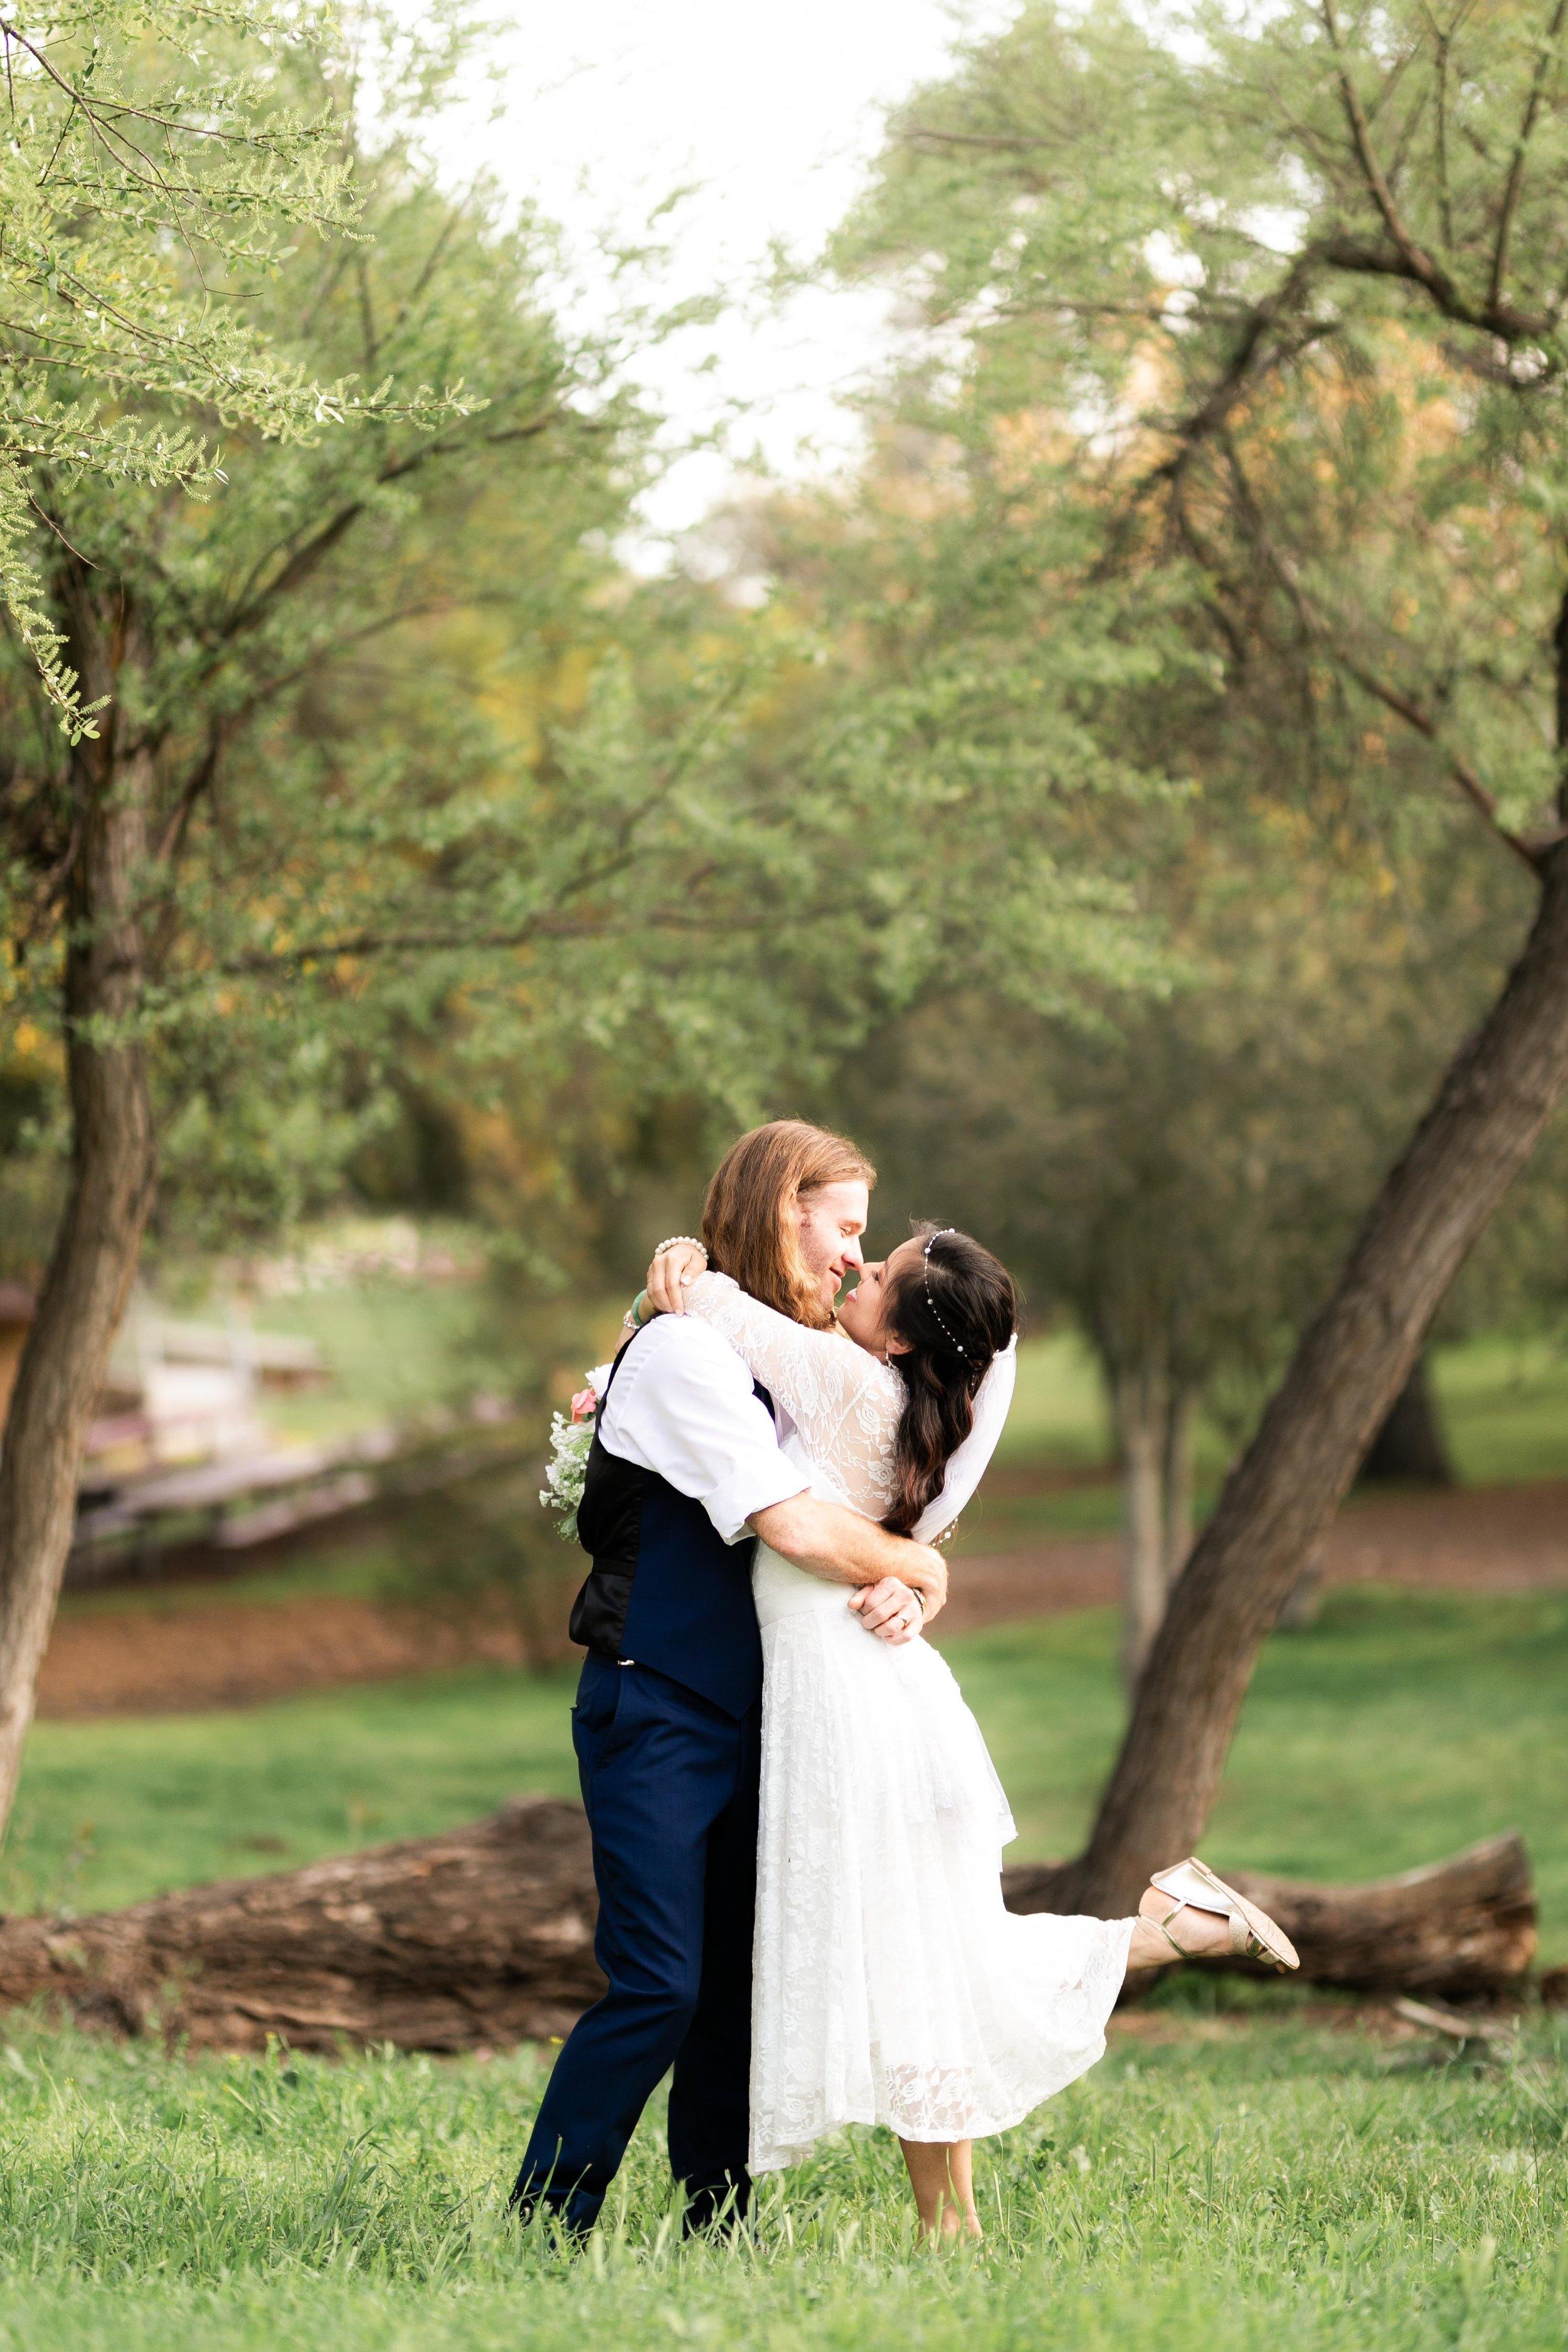 southern_california_wedding_joshuachun_photography_portraits-17.JPG